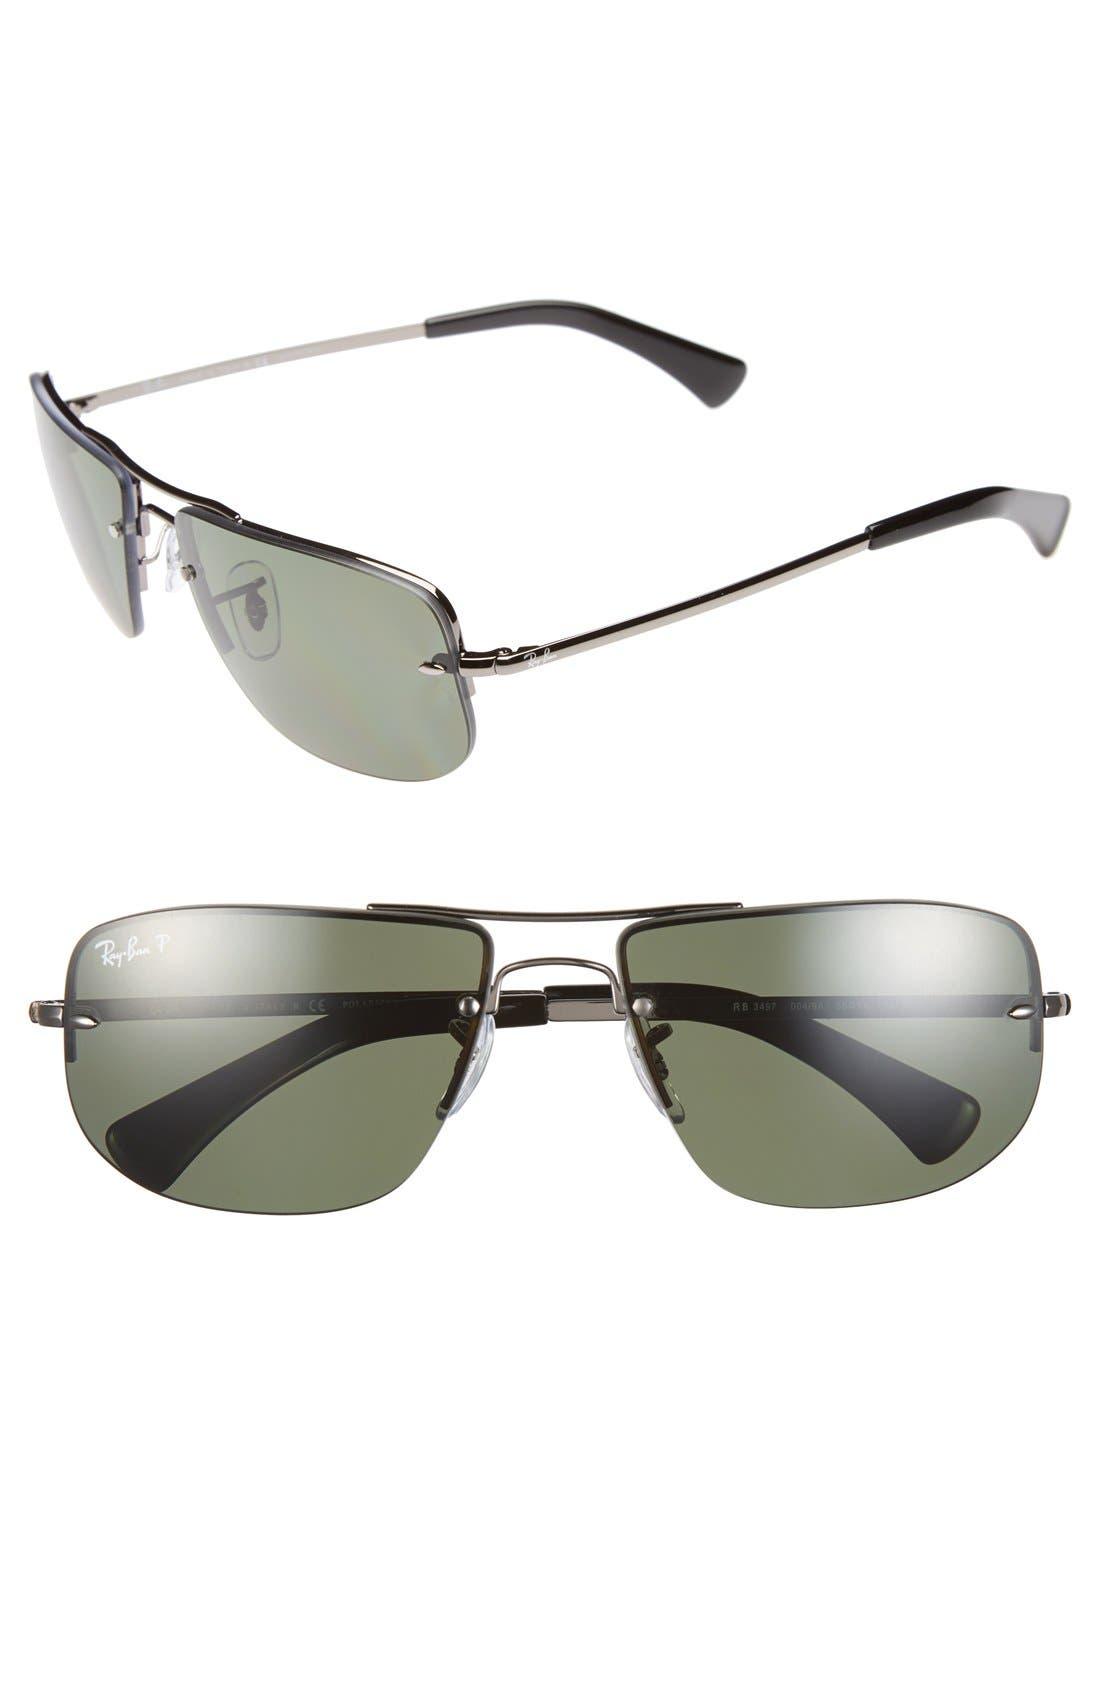 Main Image - Ray-Ban 59mm Polarized Sunglasses